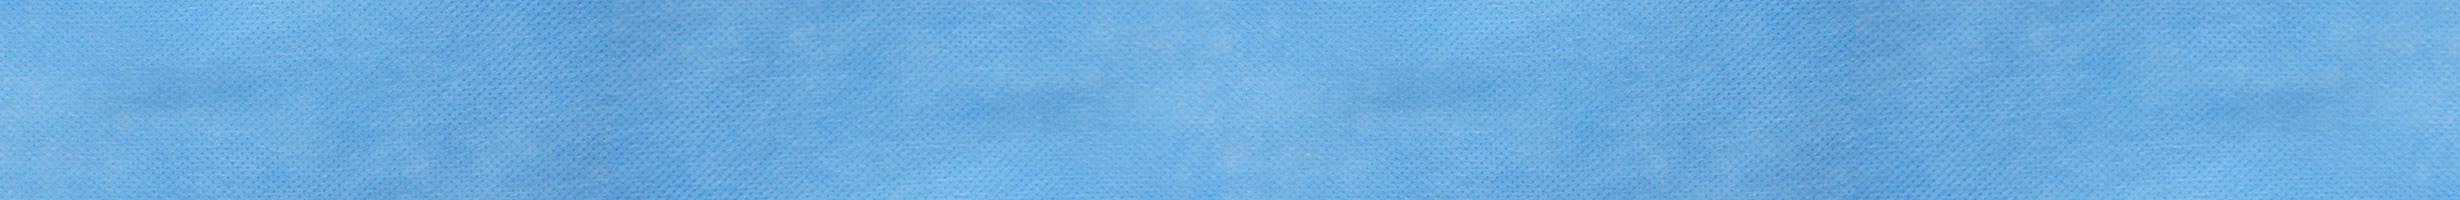 banner-friselinas